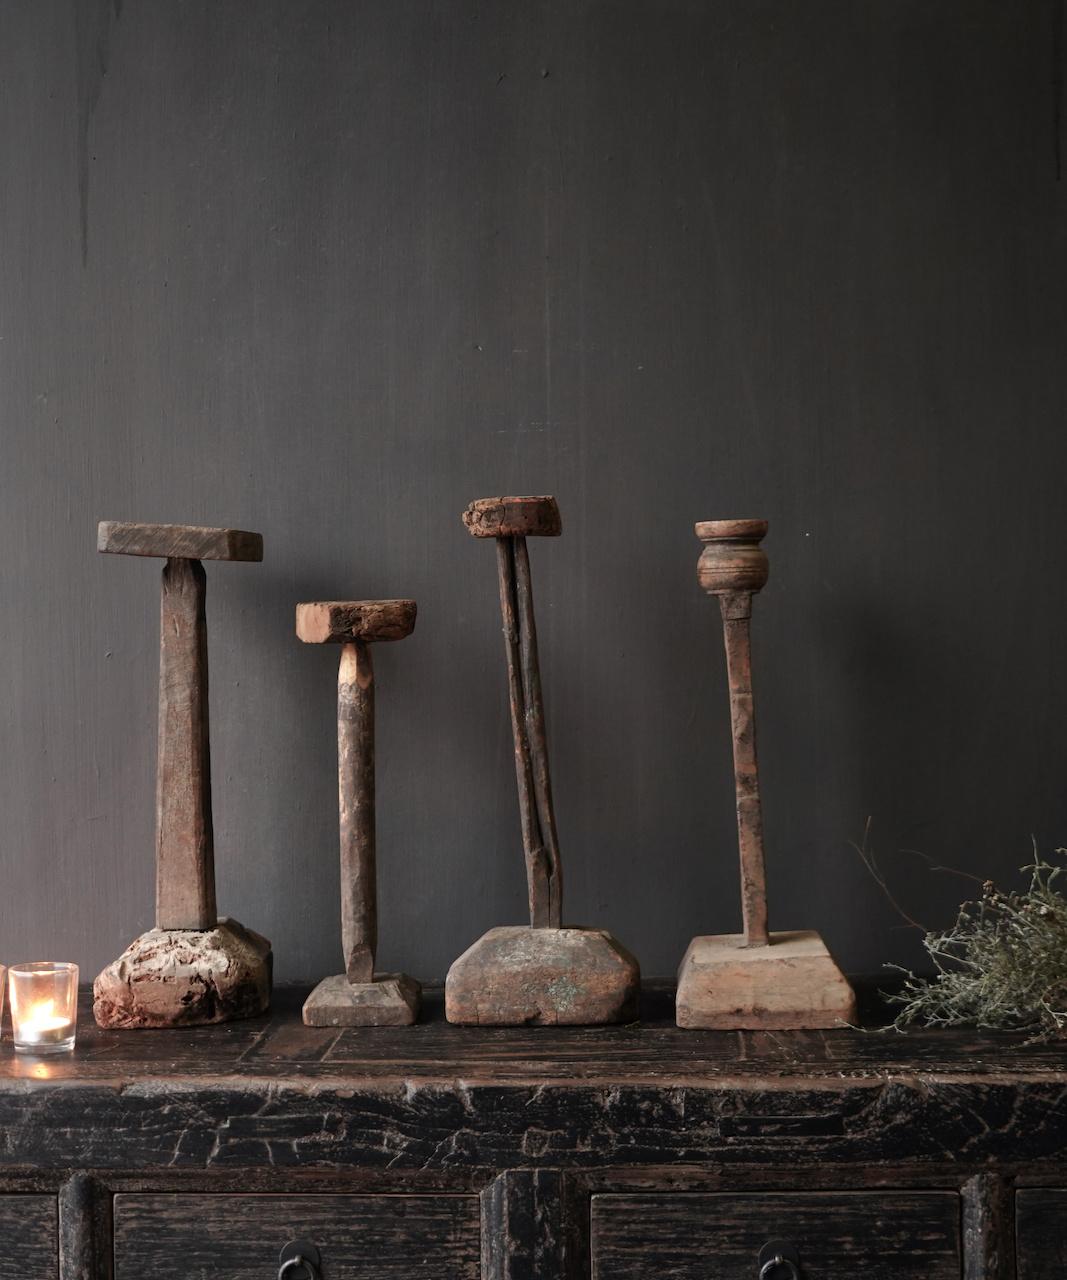 Wooden Stamper candlestick-3